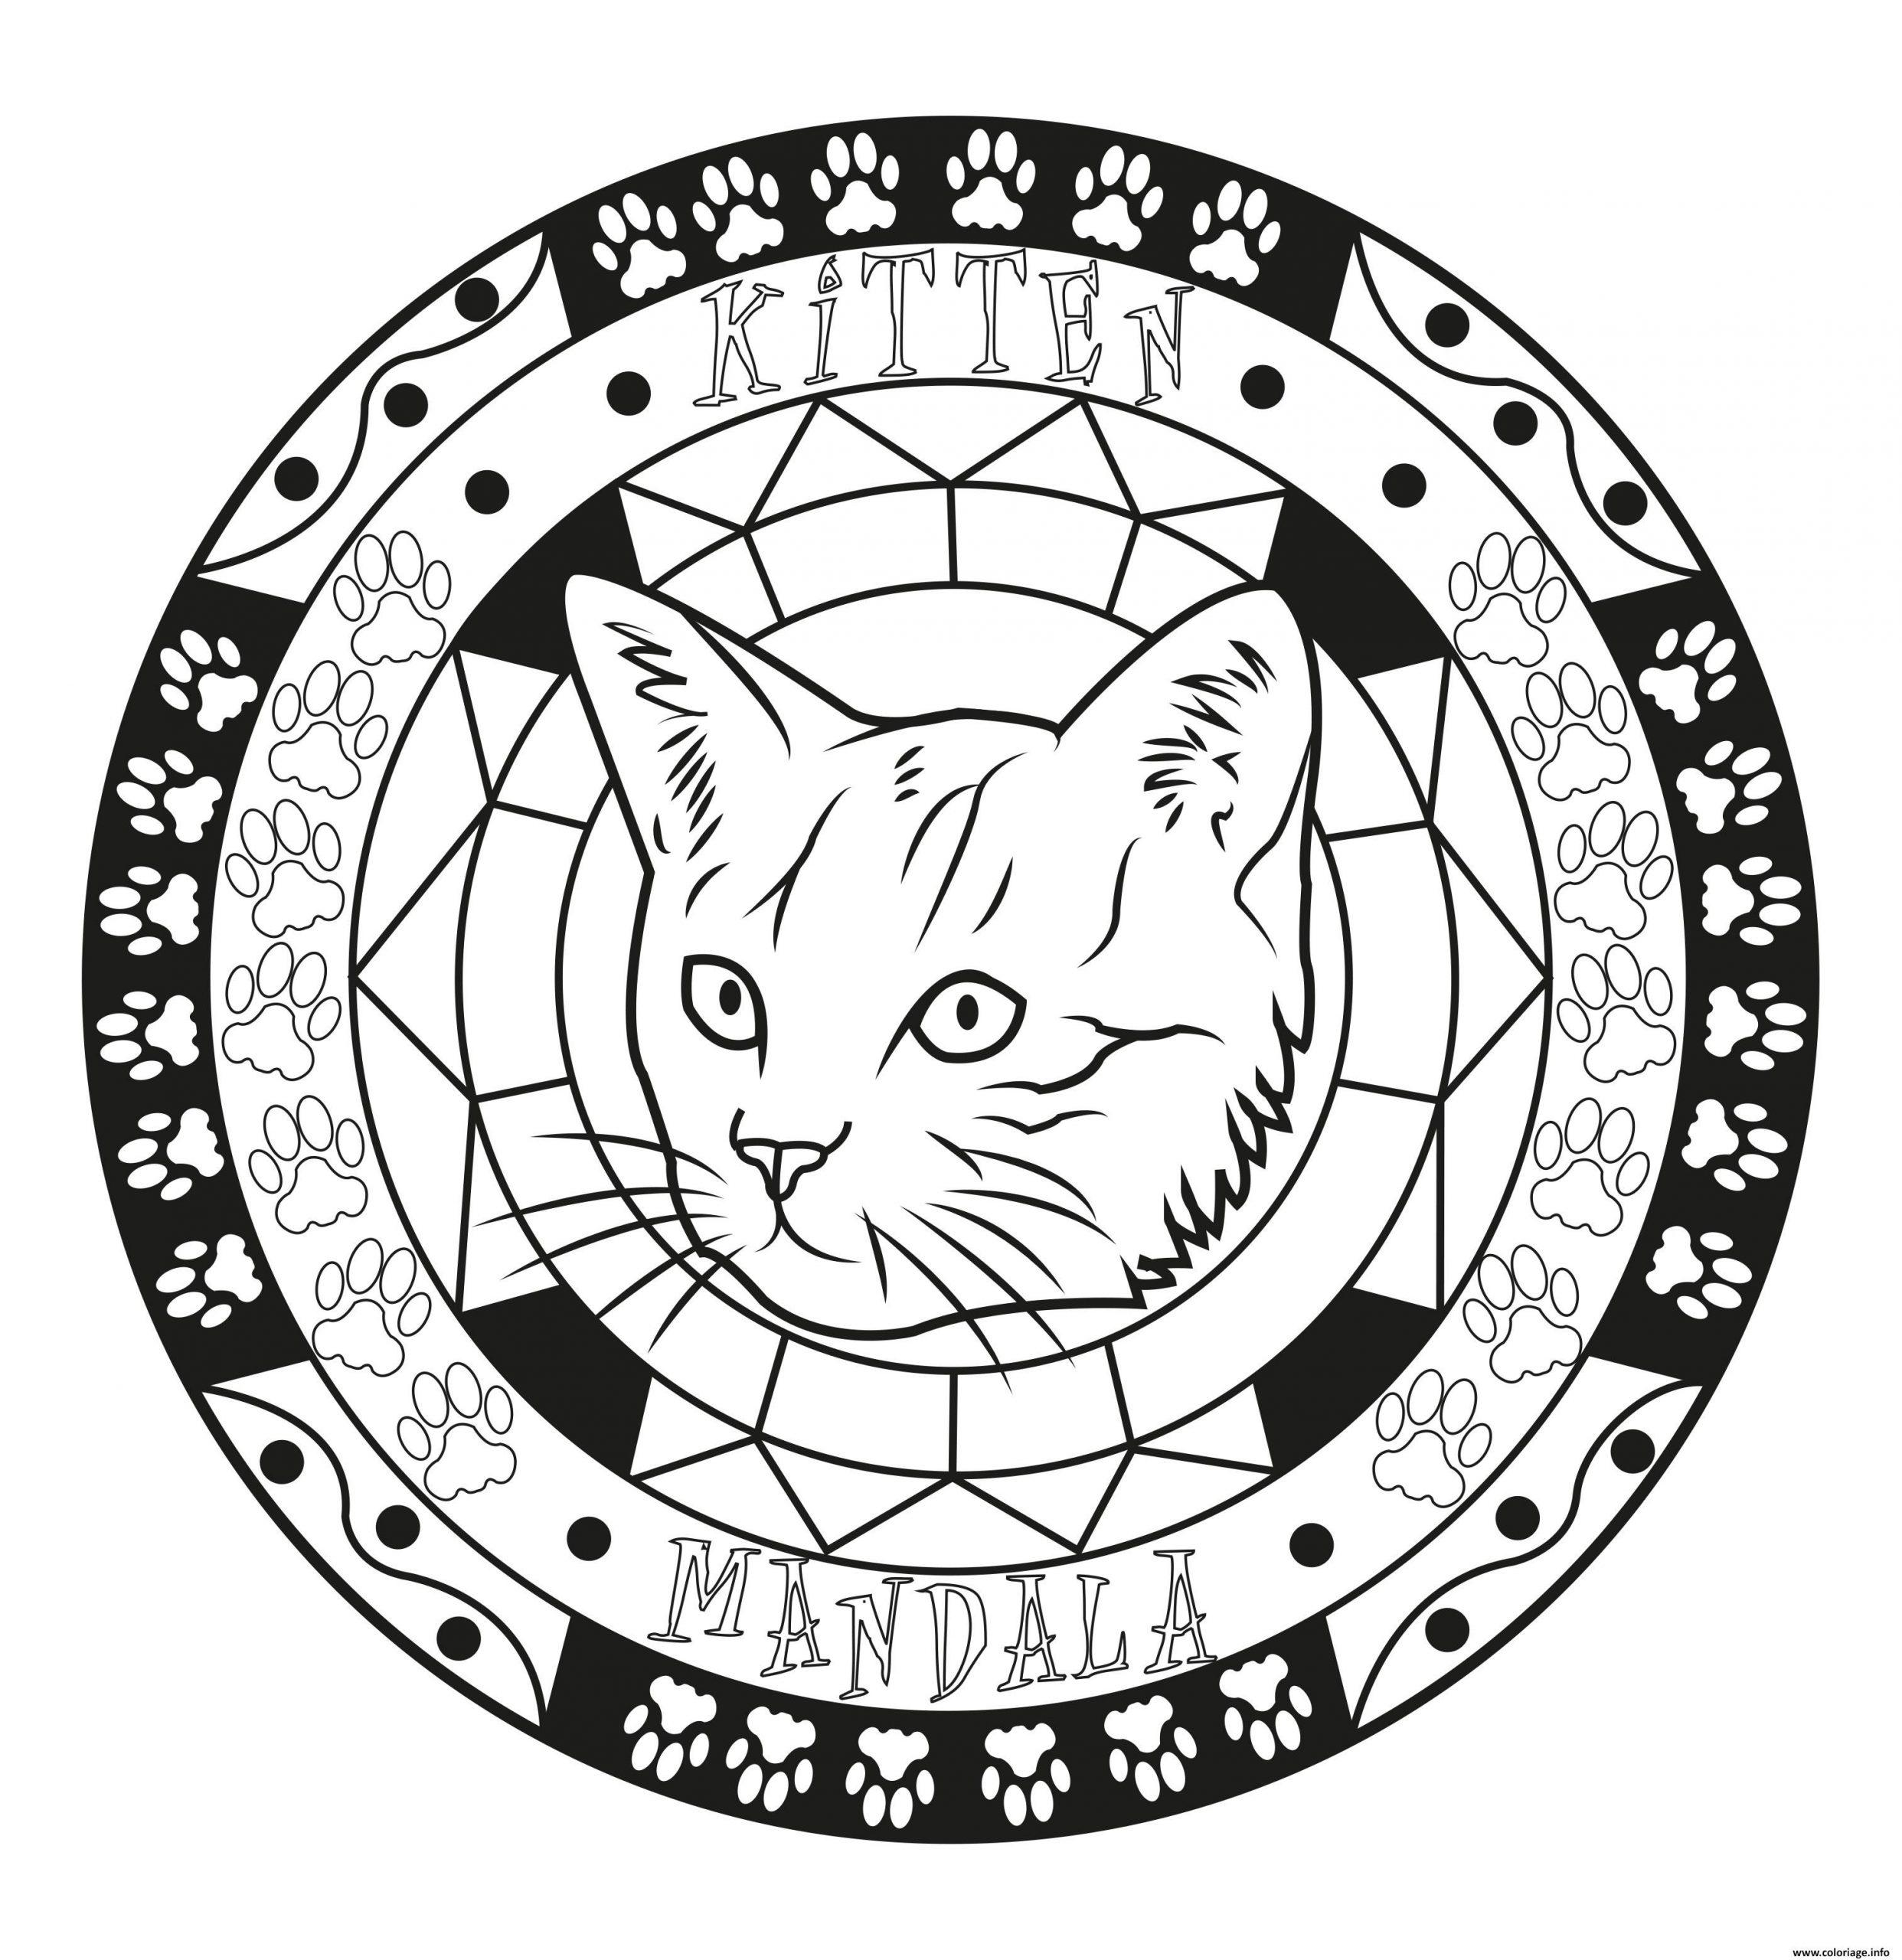 Coloriage Adulte Mandala Chat Chaton Original Facile Dessin encequiconcerne Mandala Facile À Imprimer